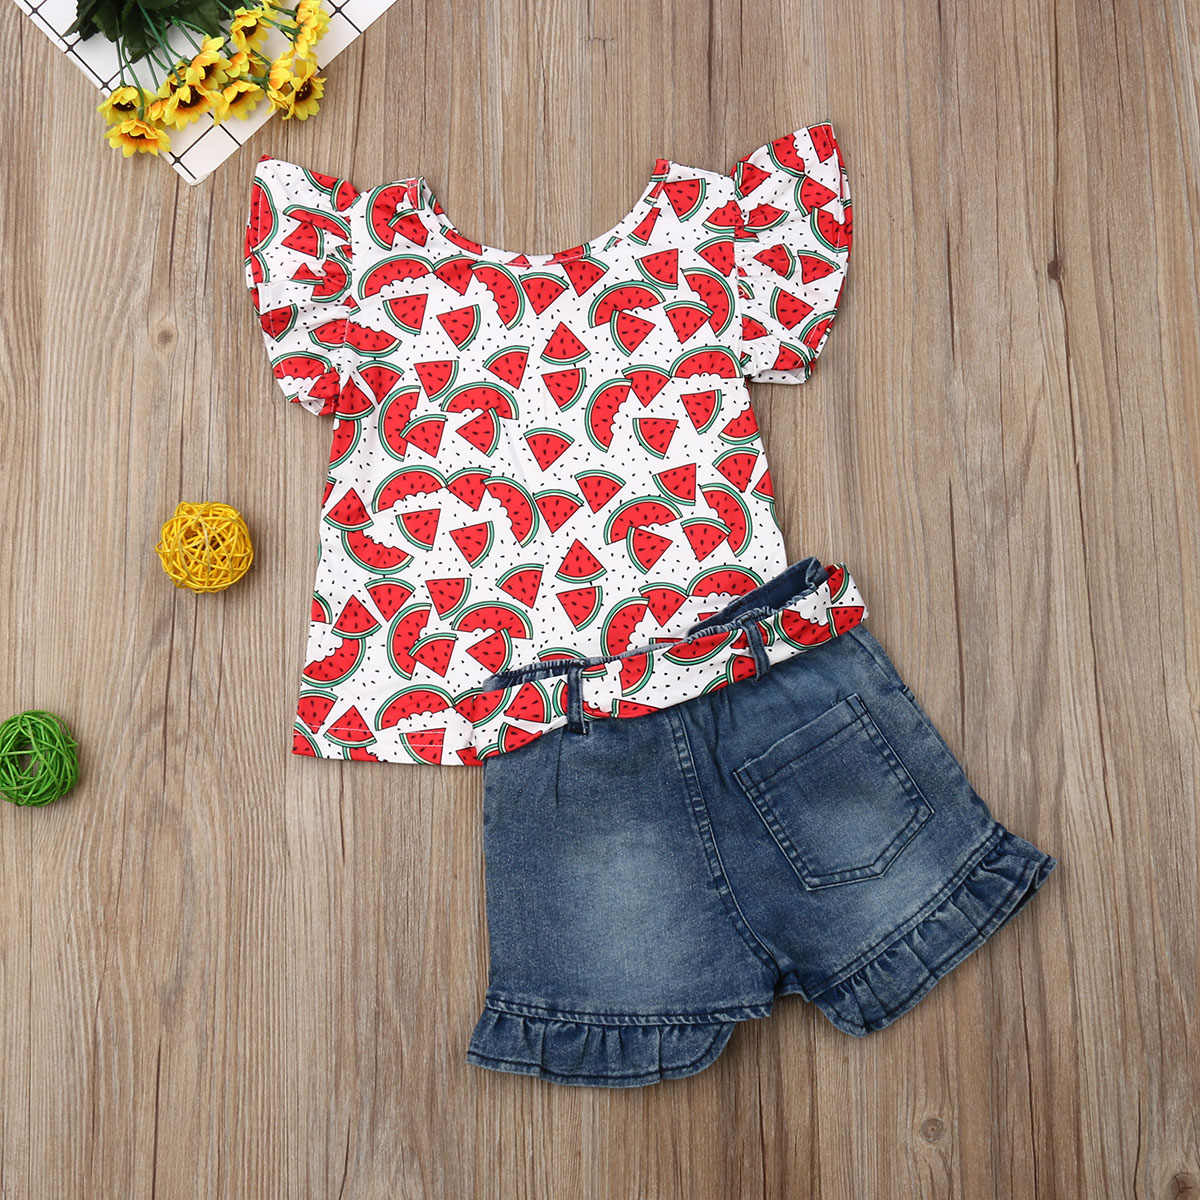 Emmababy 2019 Nieuwe Merk Peuter Kids Baby Meisjes Cartoon Tops T-shirt Denim Shorts Outfits Kleding